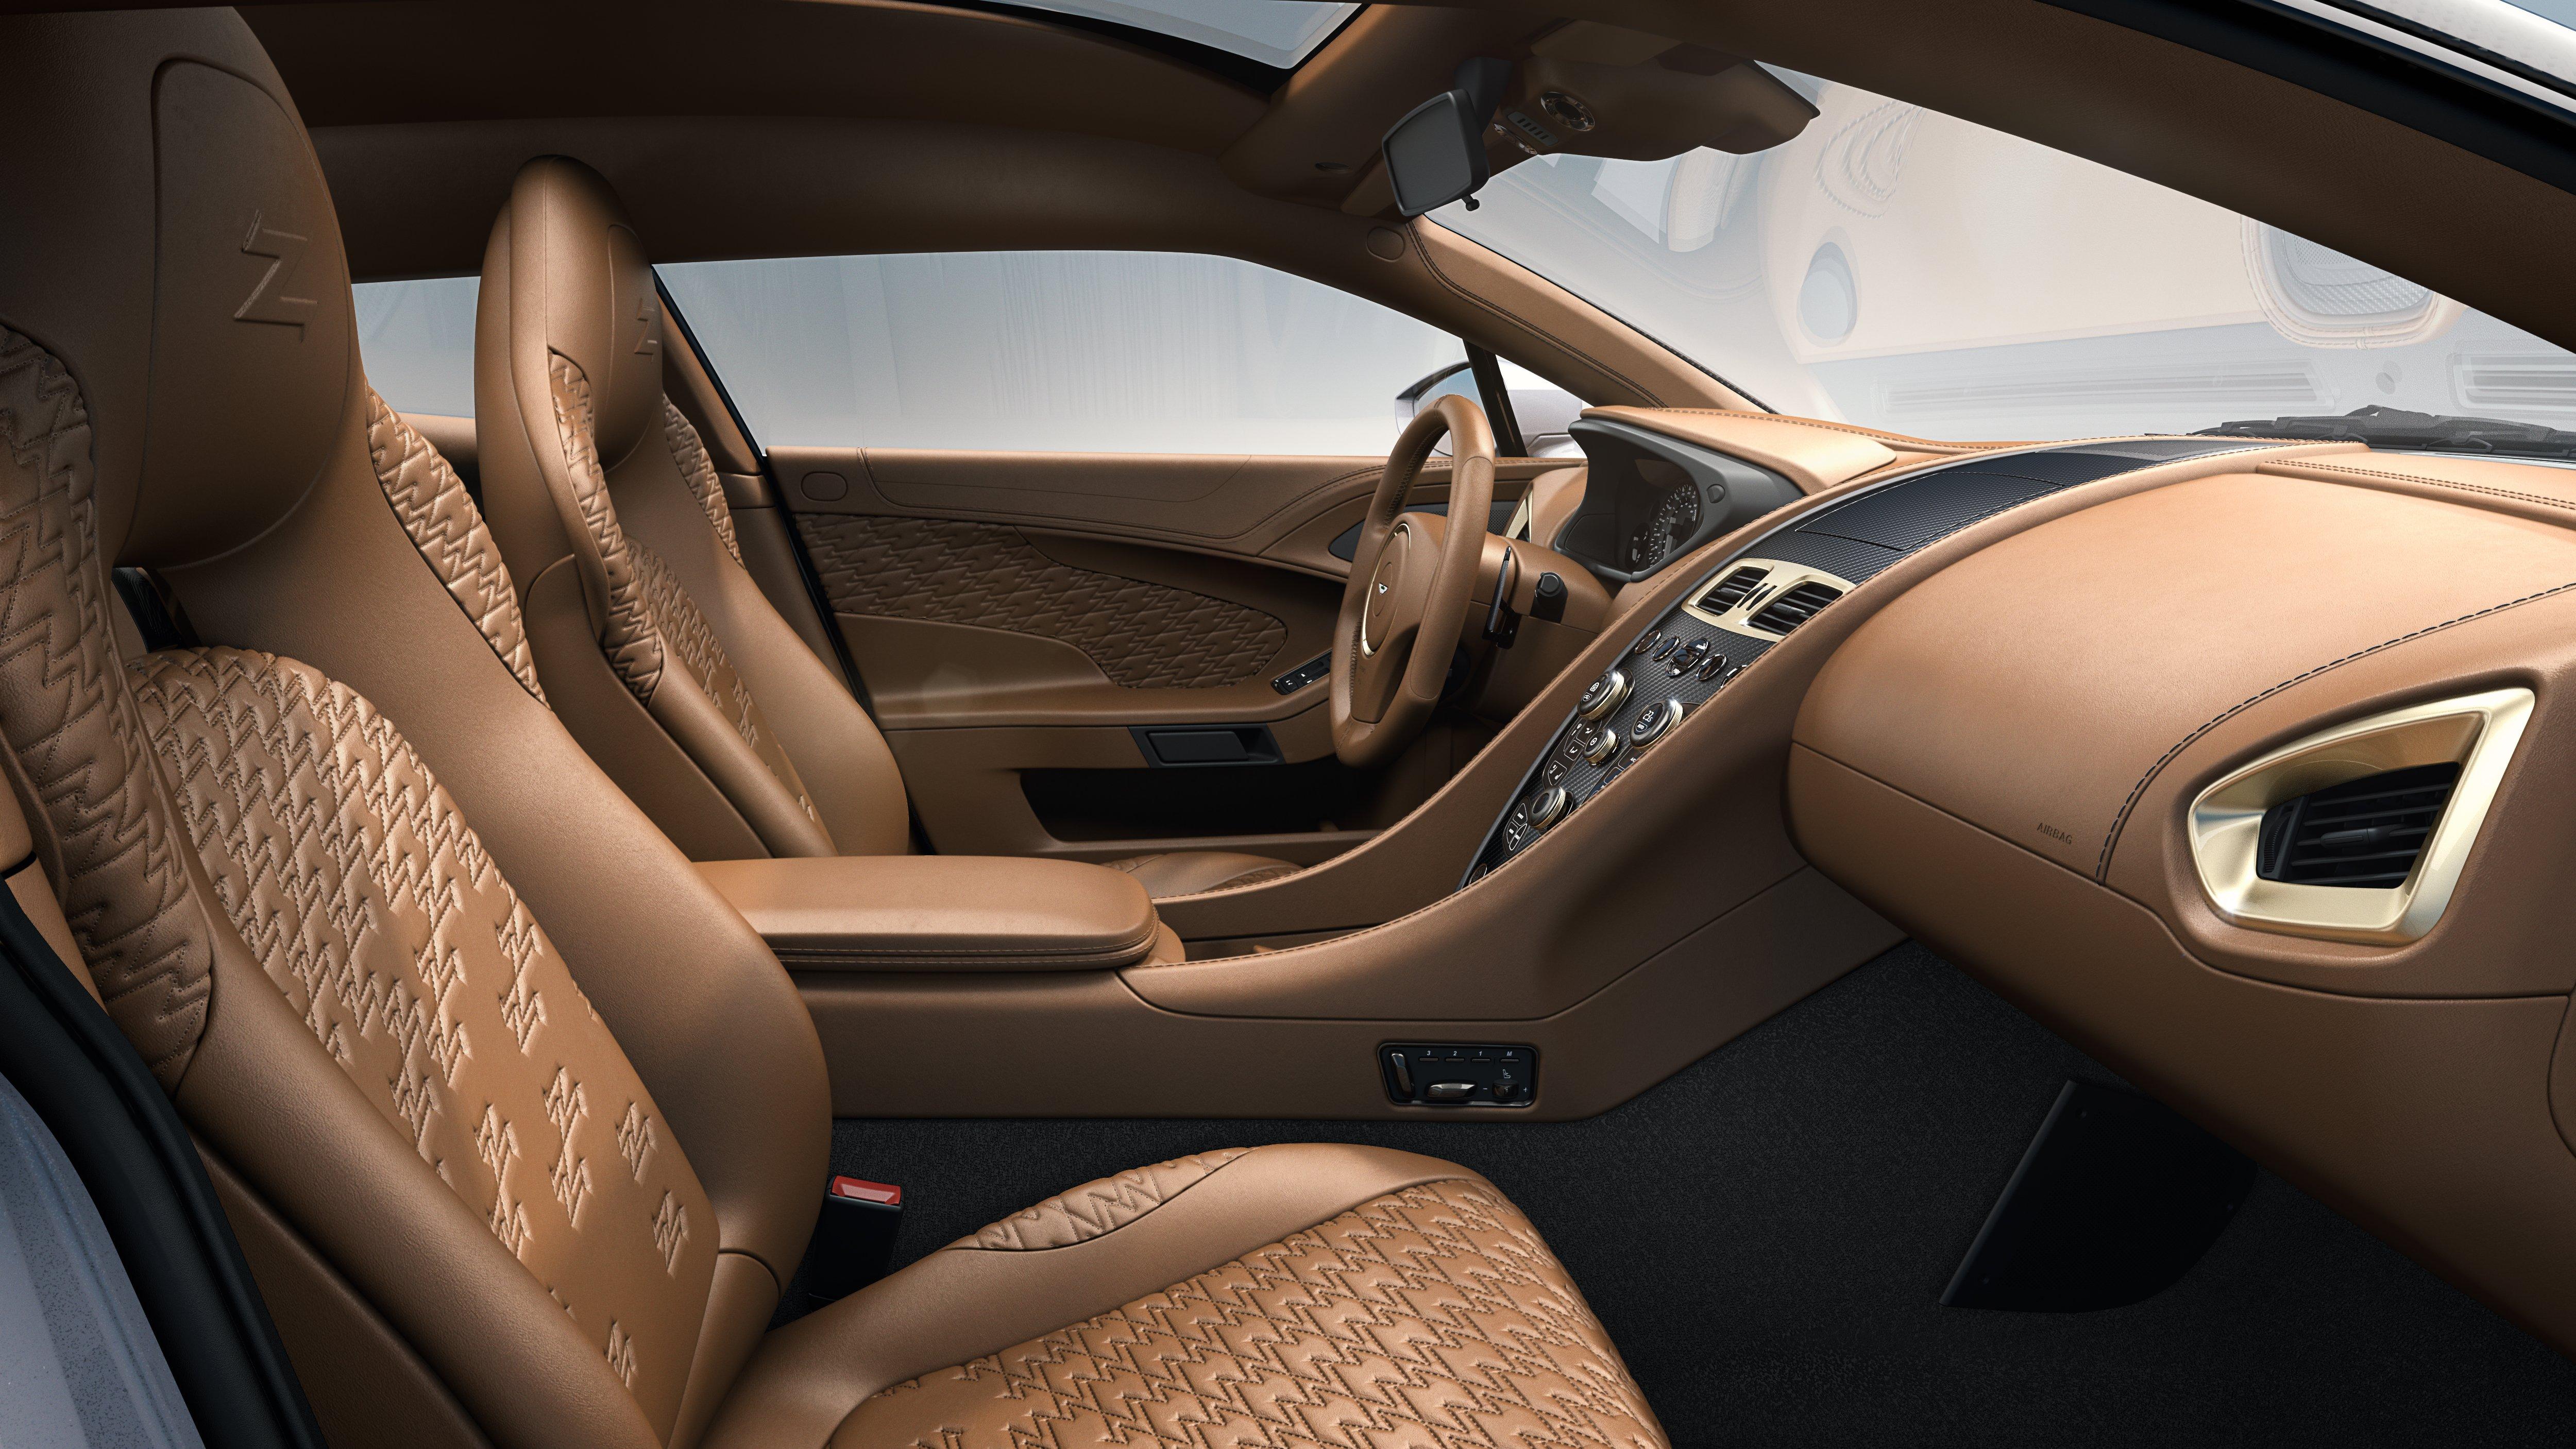 aston martin vanquish zagato shooting brake – new pics show interior